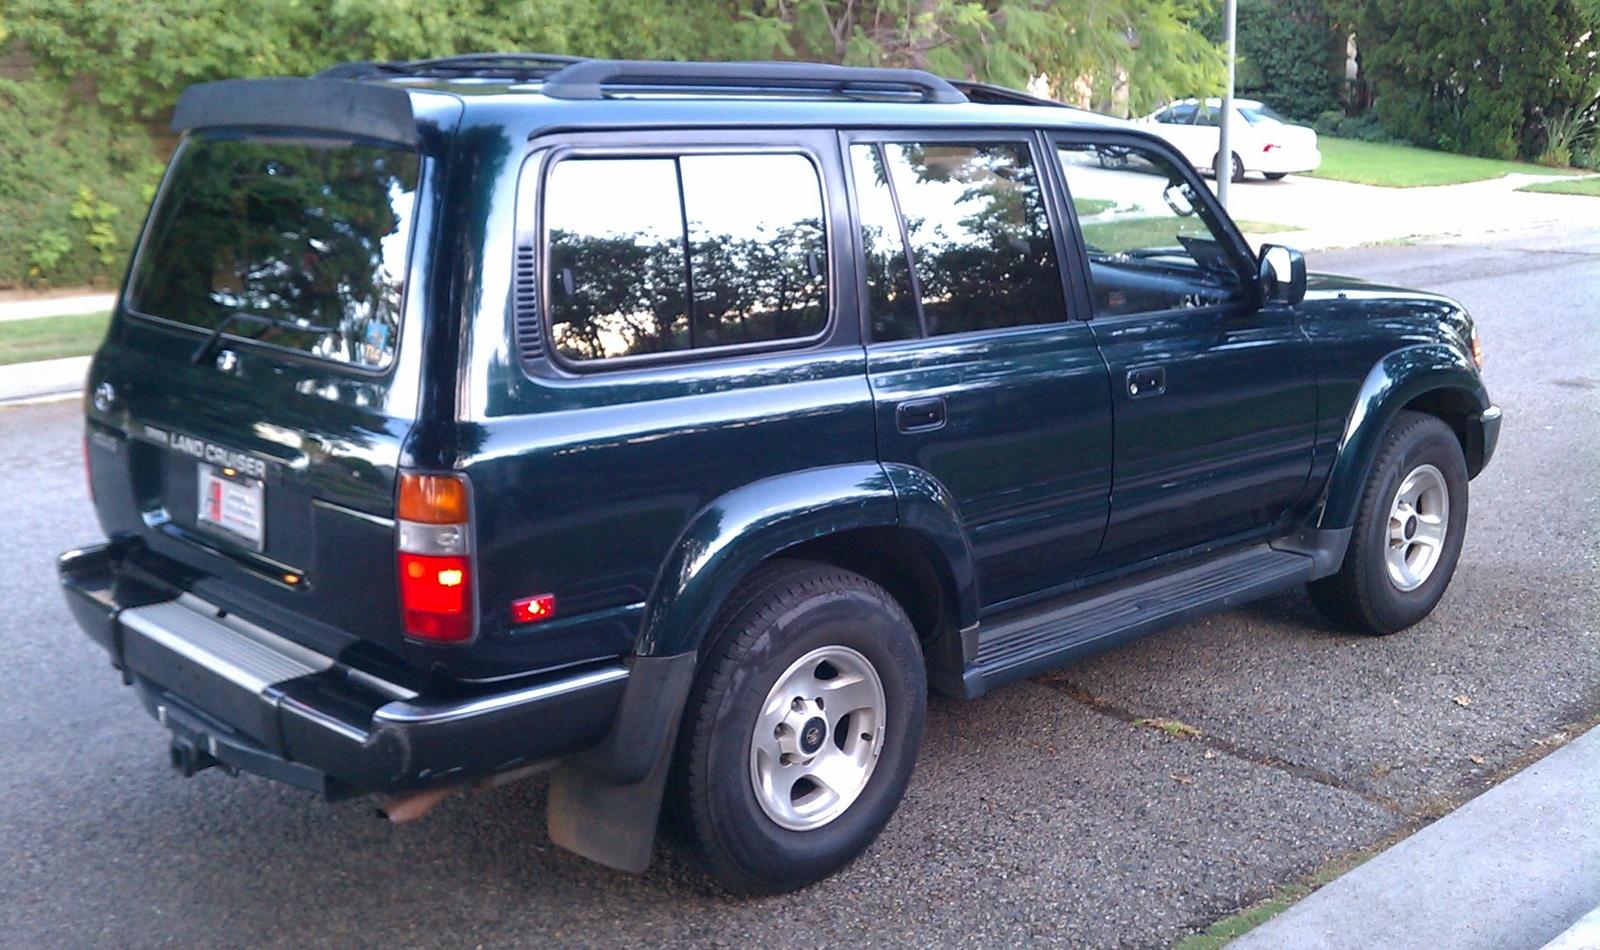 2007 Toyota Tacoma For Sale Cargurus >> 1994 Toyota Land Cruiser - Pictures - CarGurus